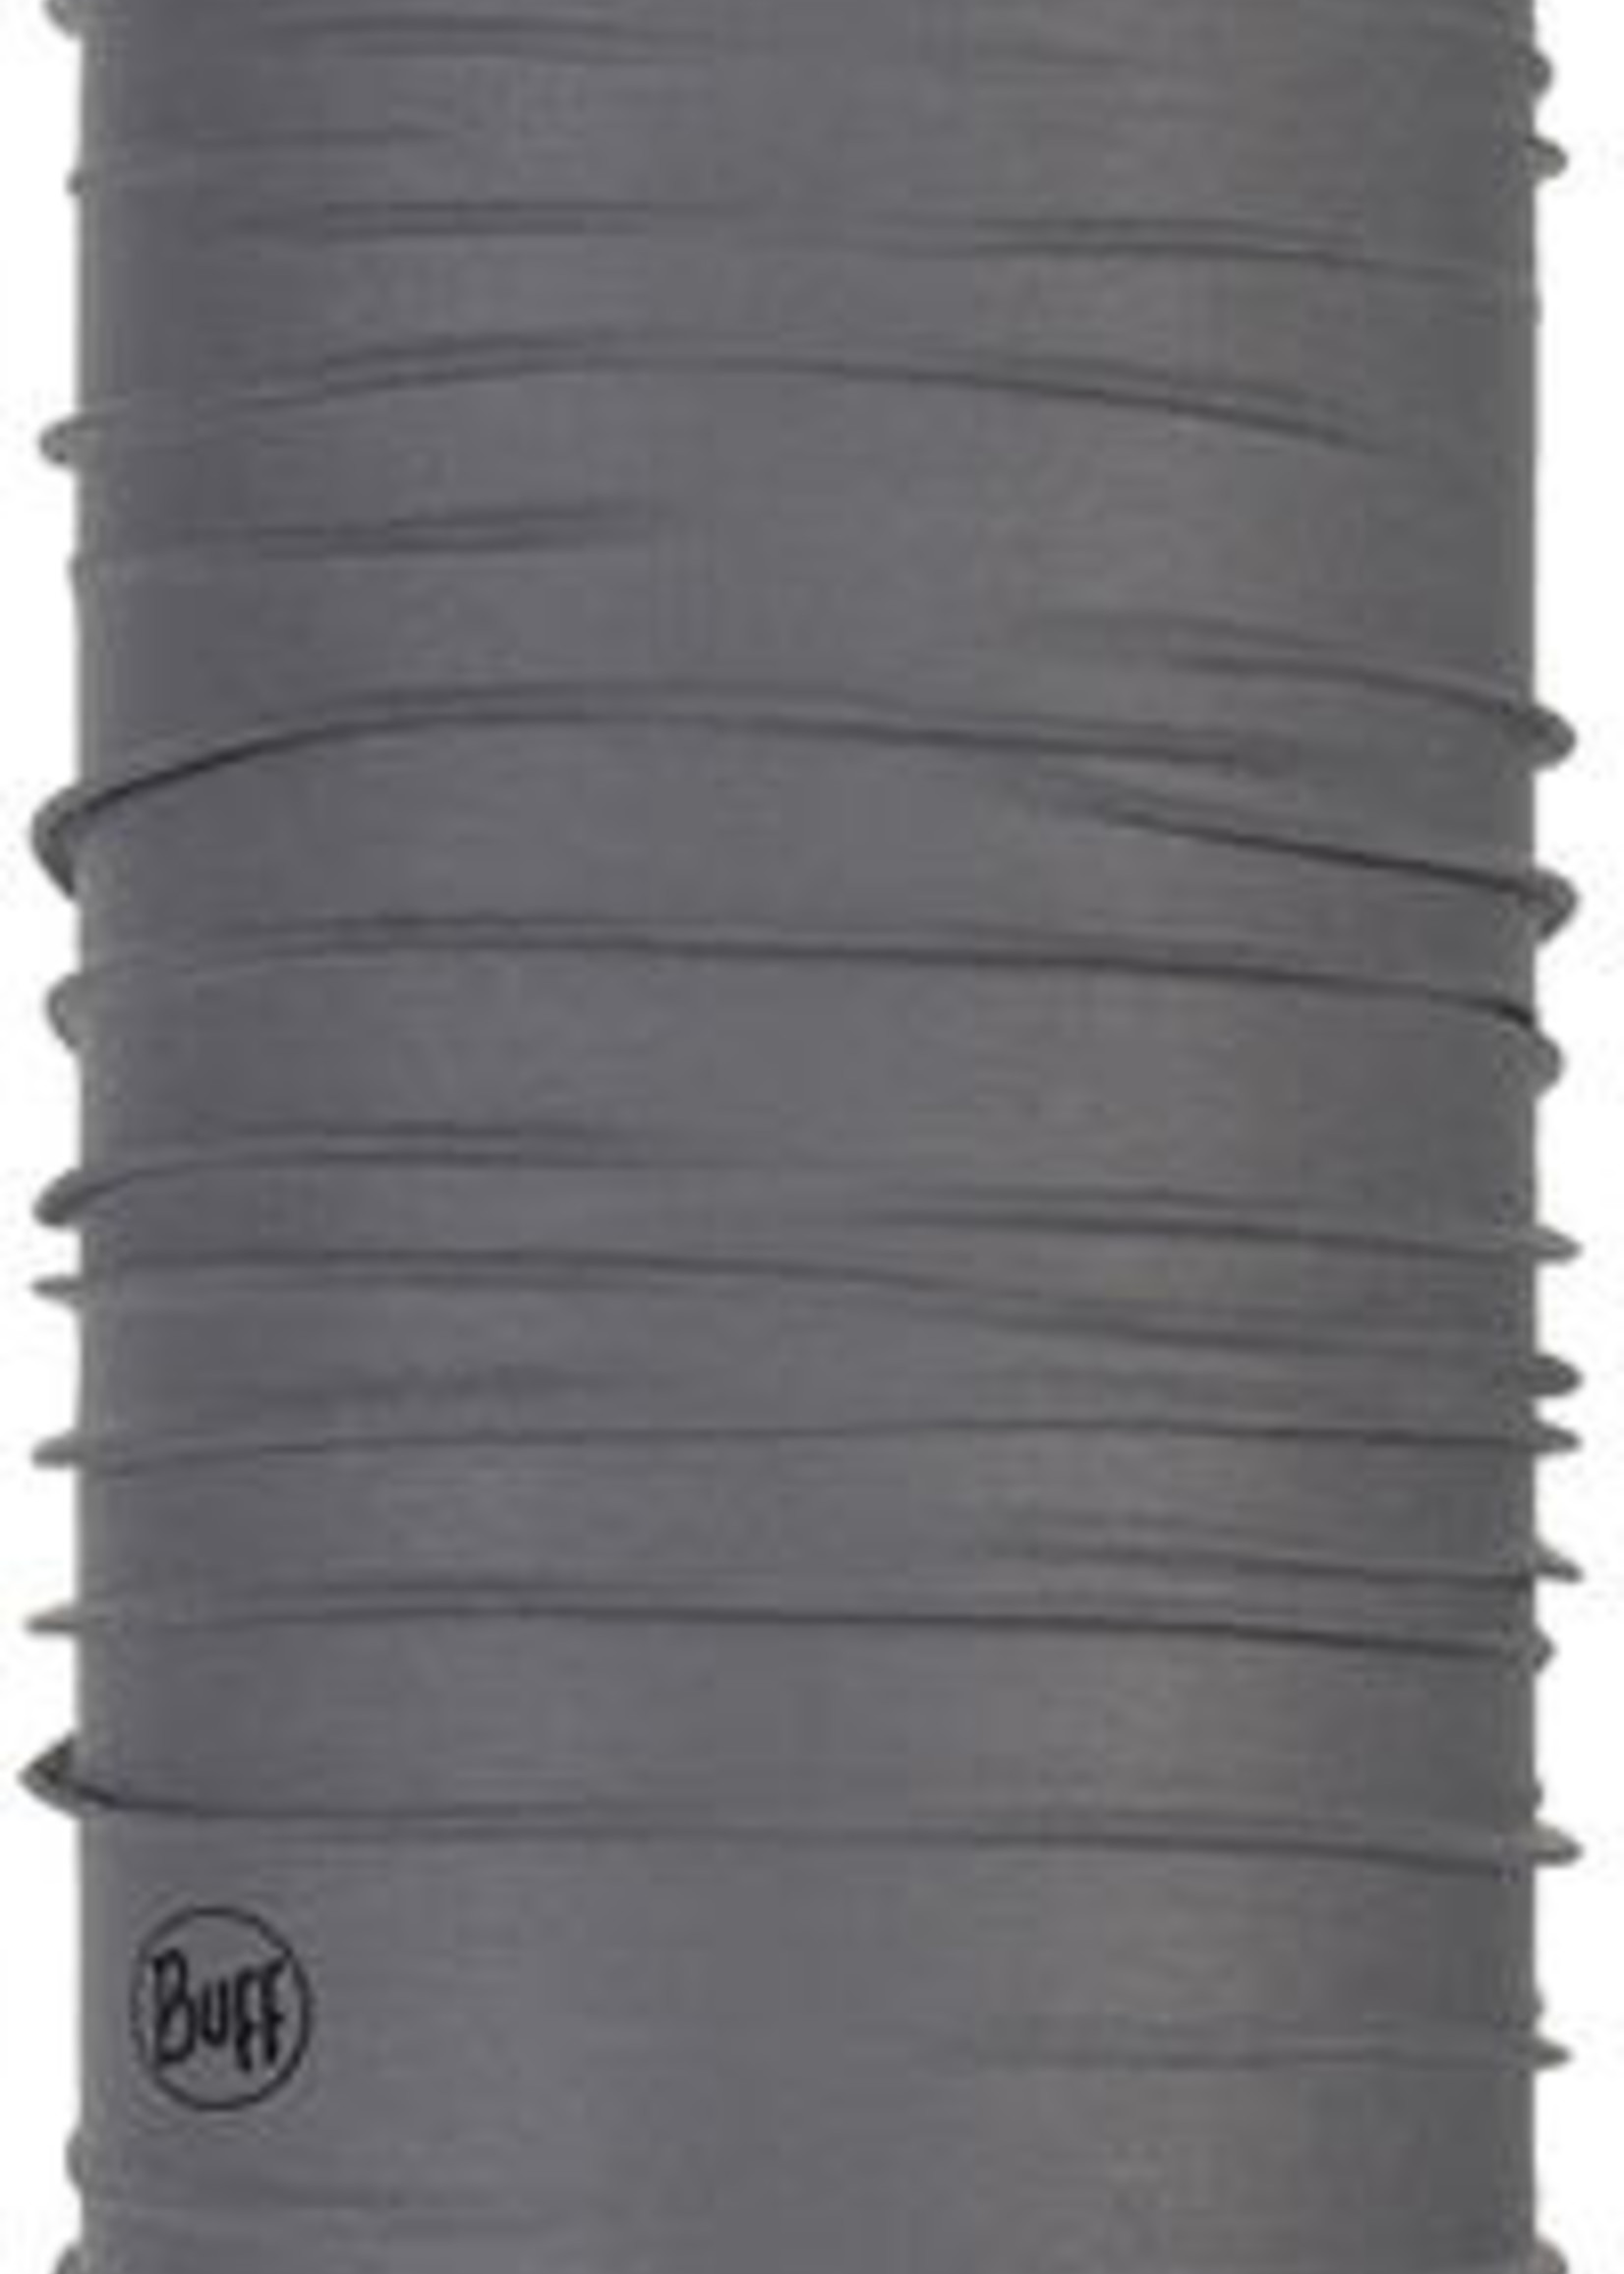 Buff Buff CoolNet UV Multifunctional Headwear